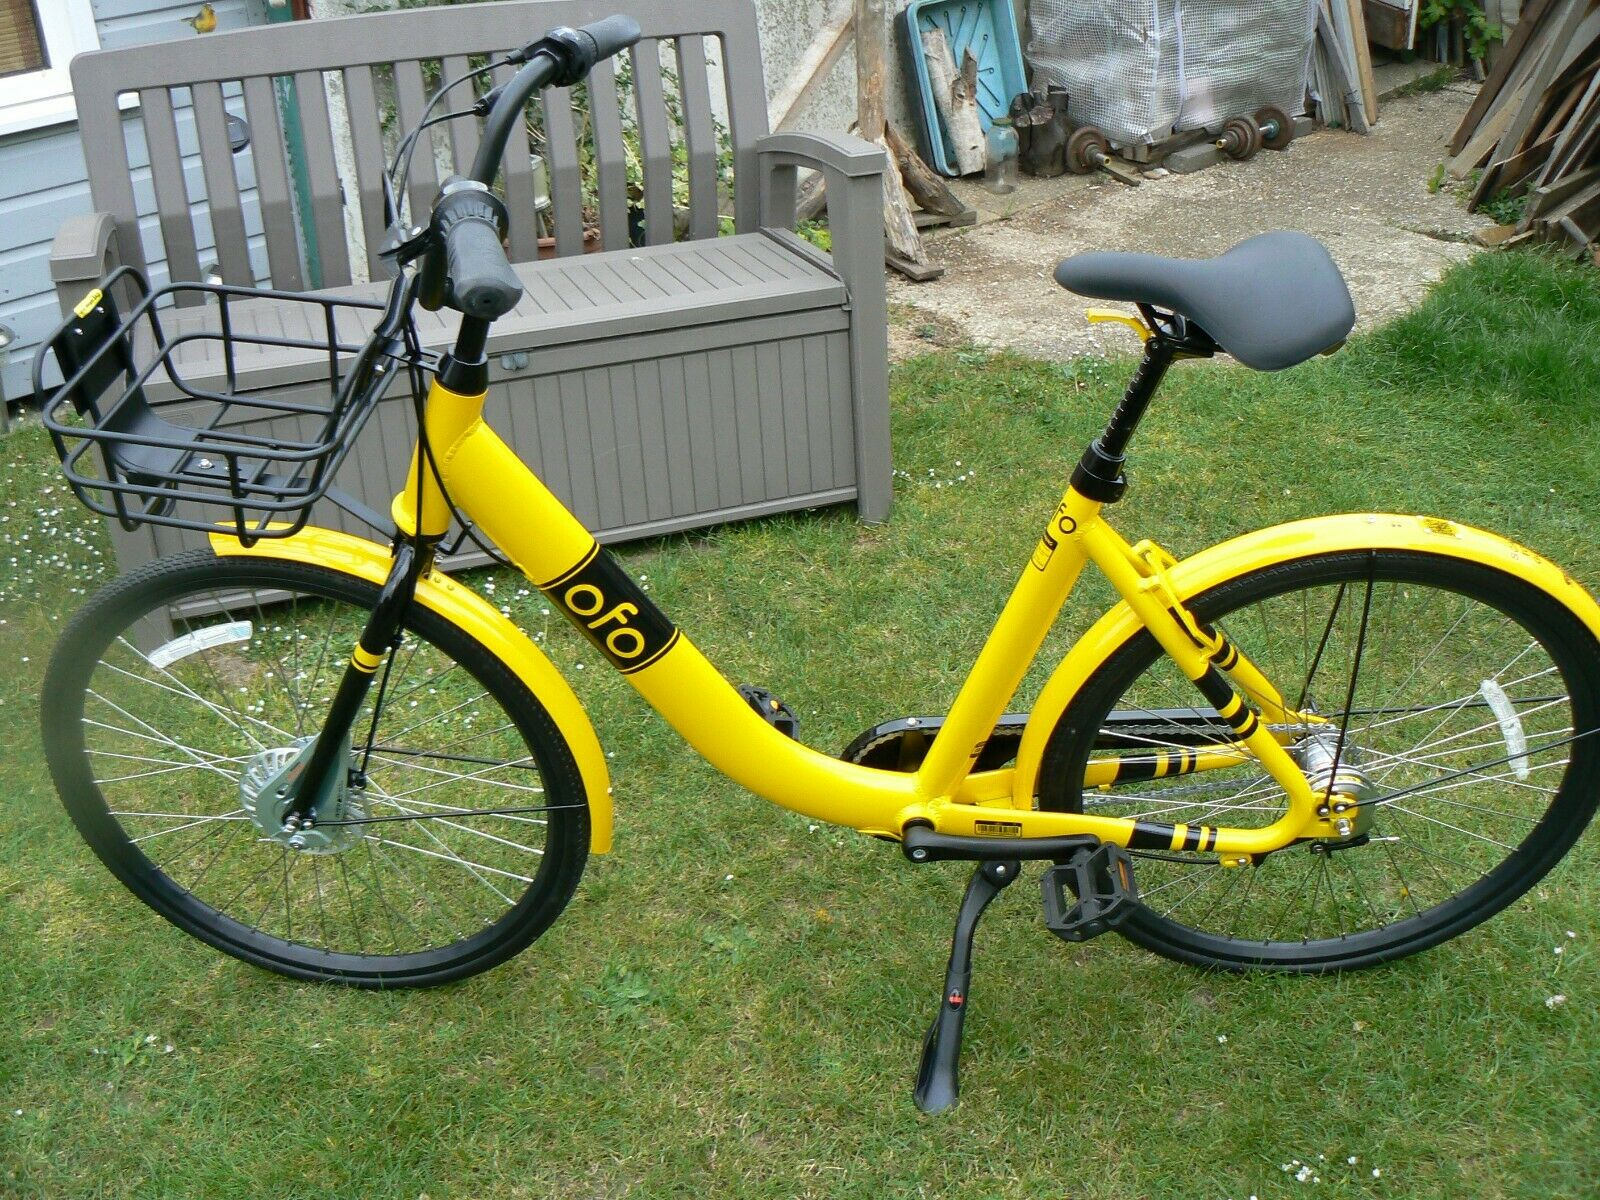 OFO ex-rental bike Brand New